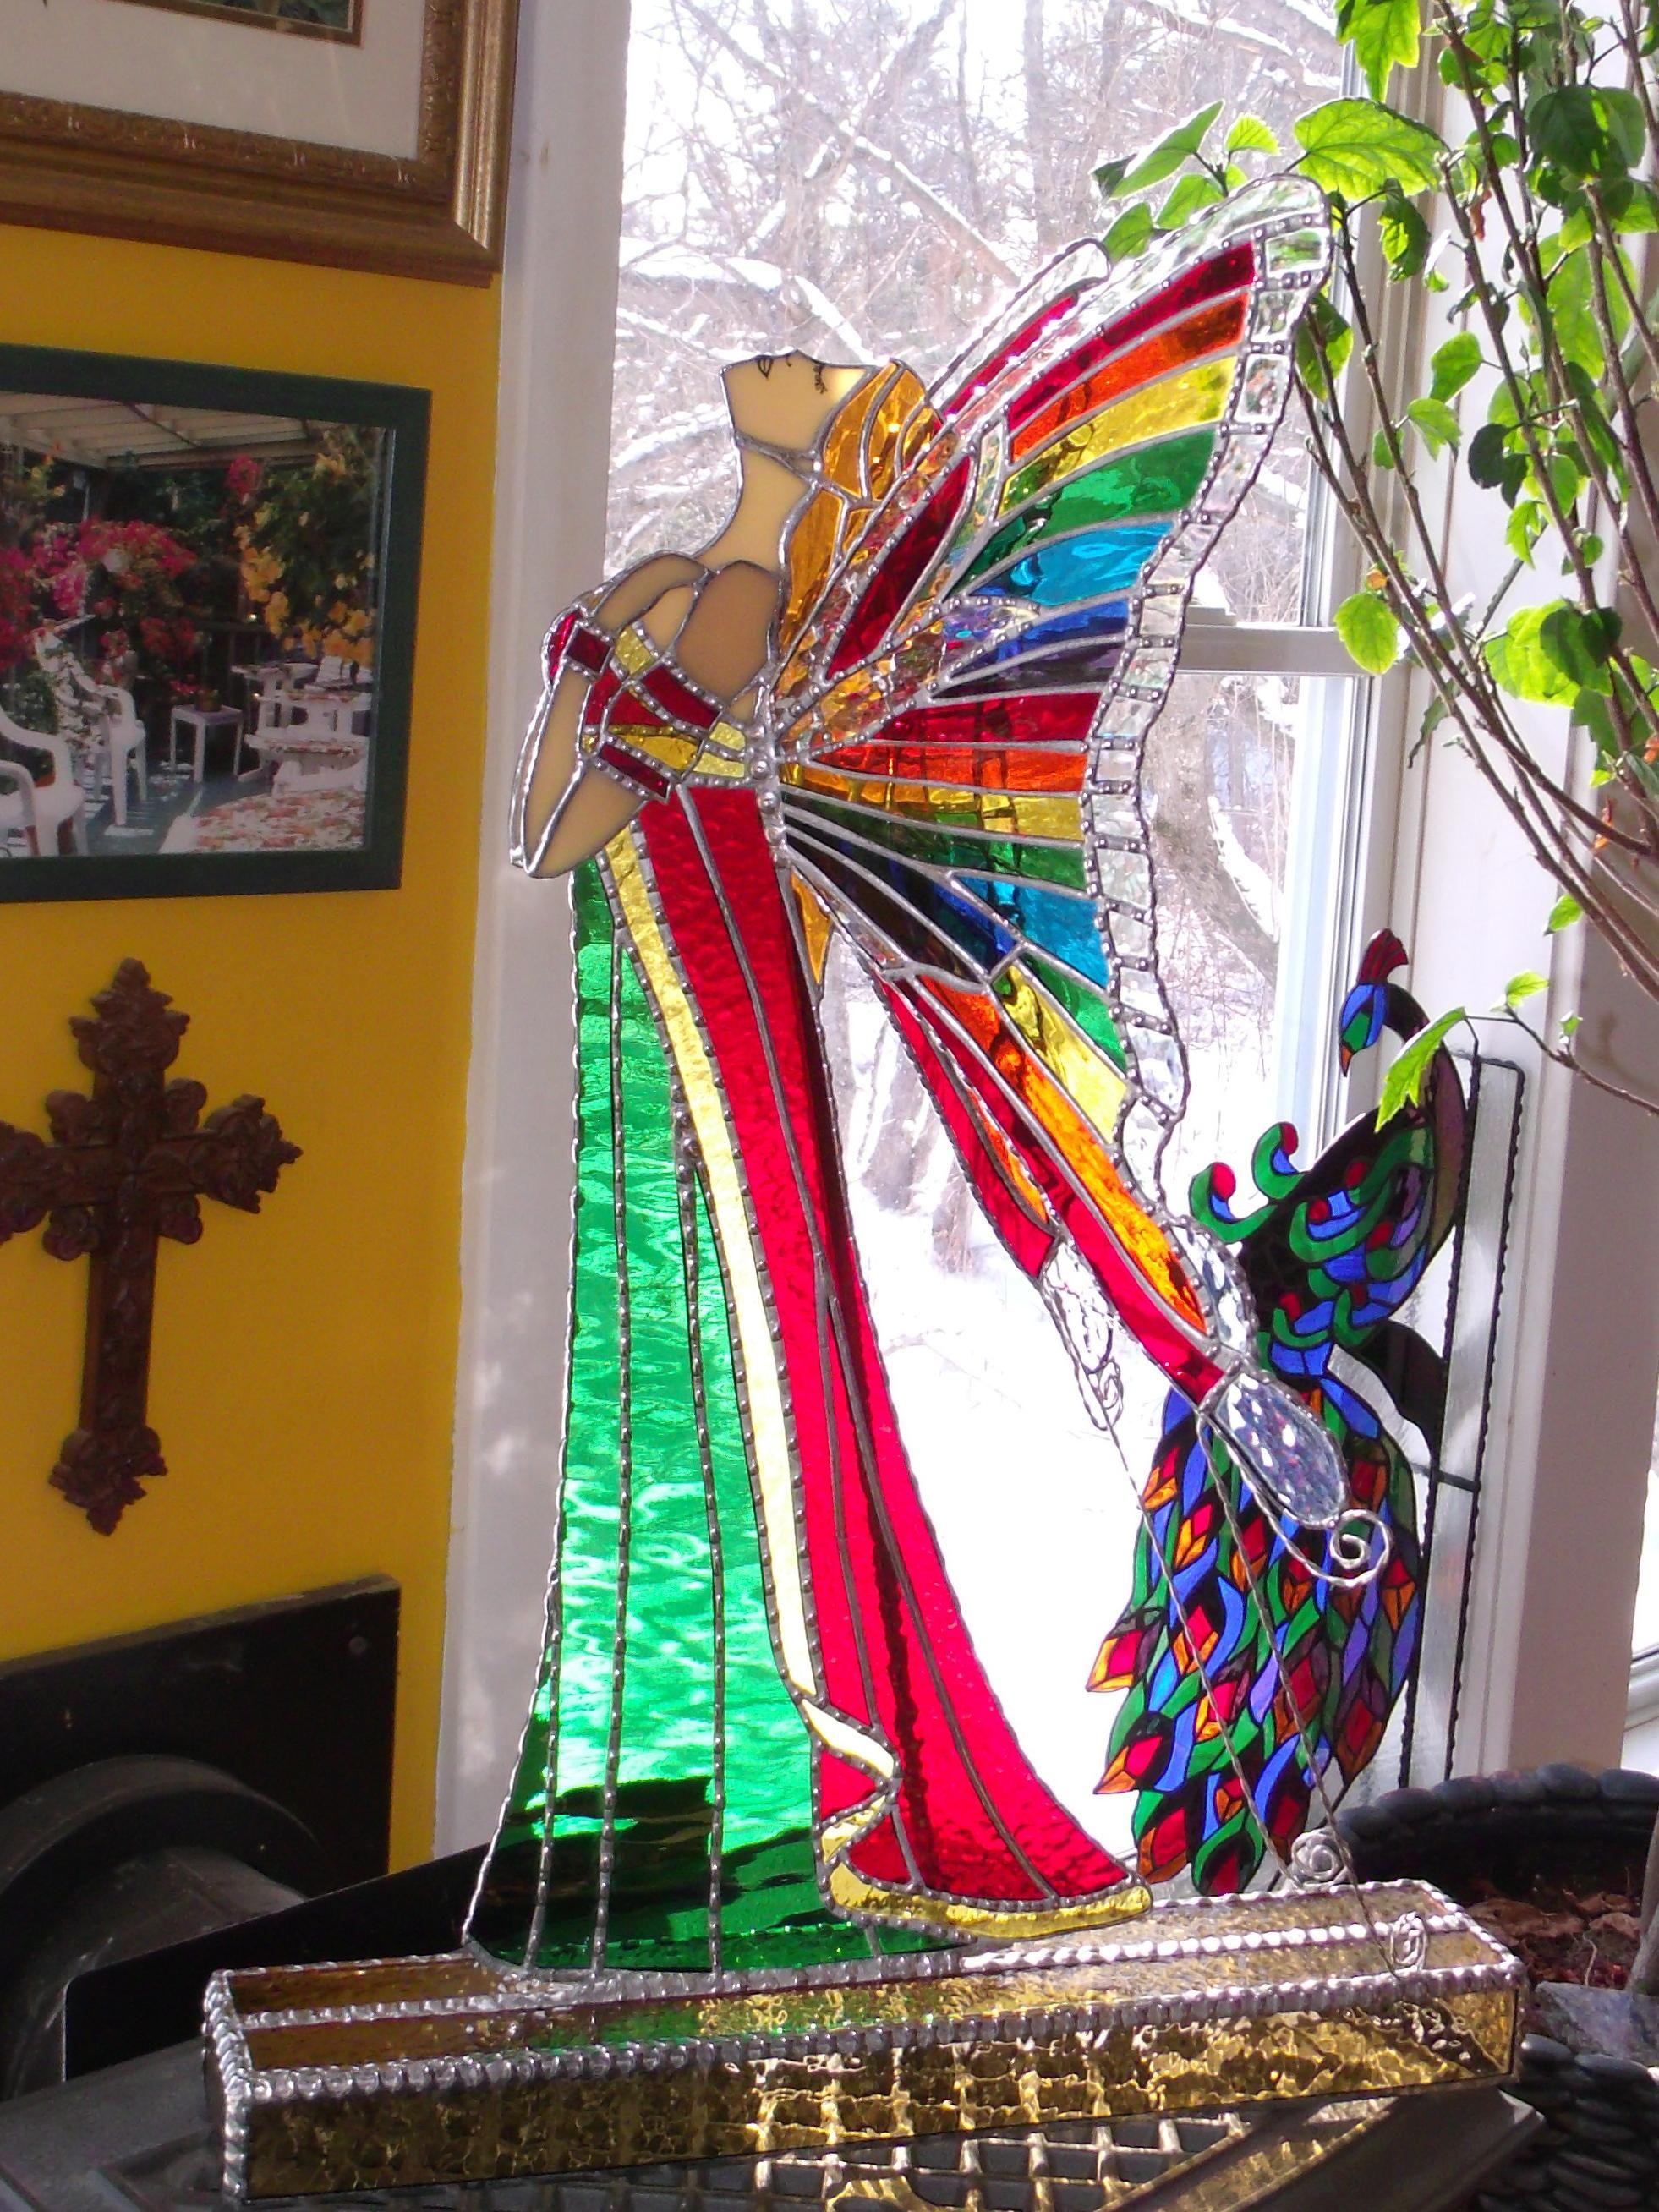 Amberlyn' Rainbow Angel - Delphi Artist Stained